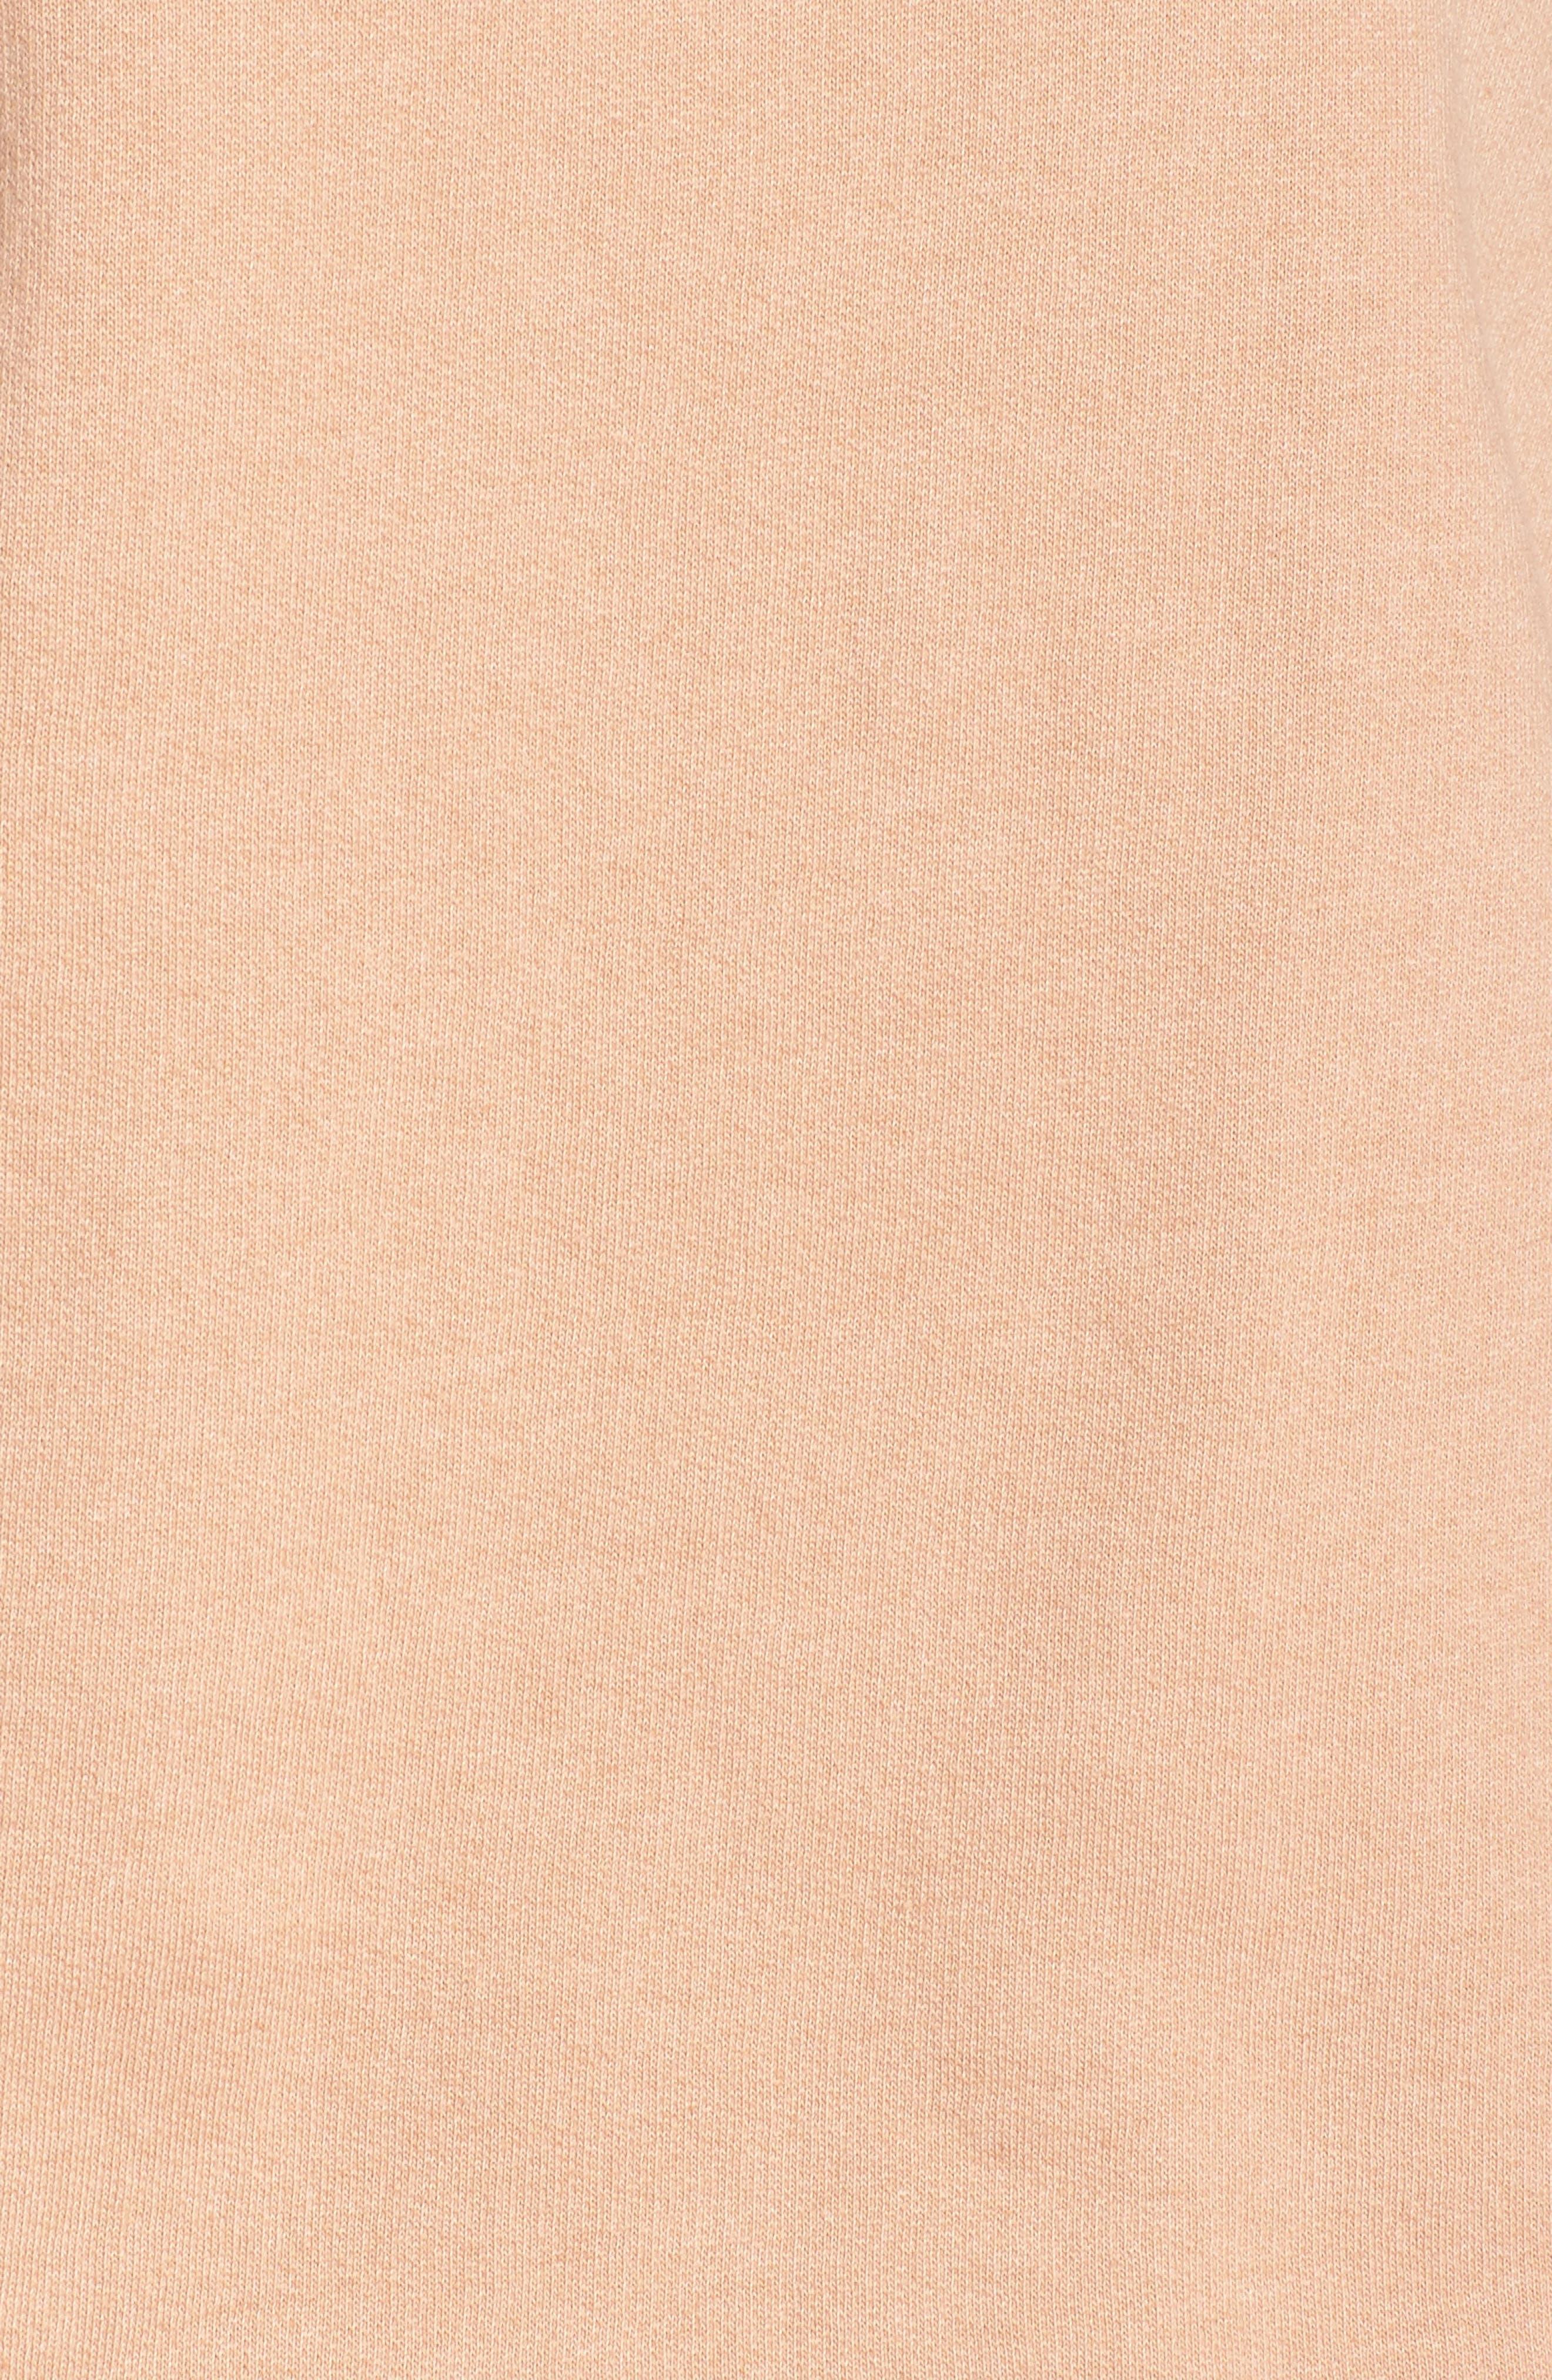 Middle Sister Blonde Sweatshirt,                             Alternate thumbnail 7, color,                             Beige